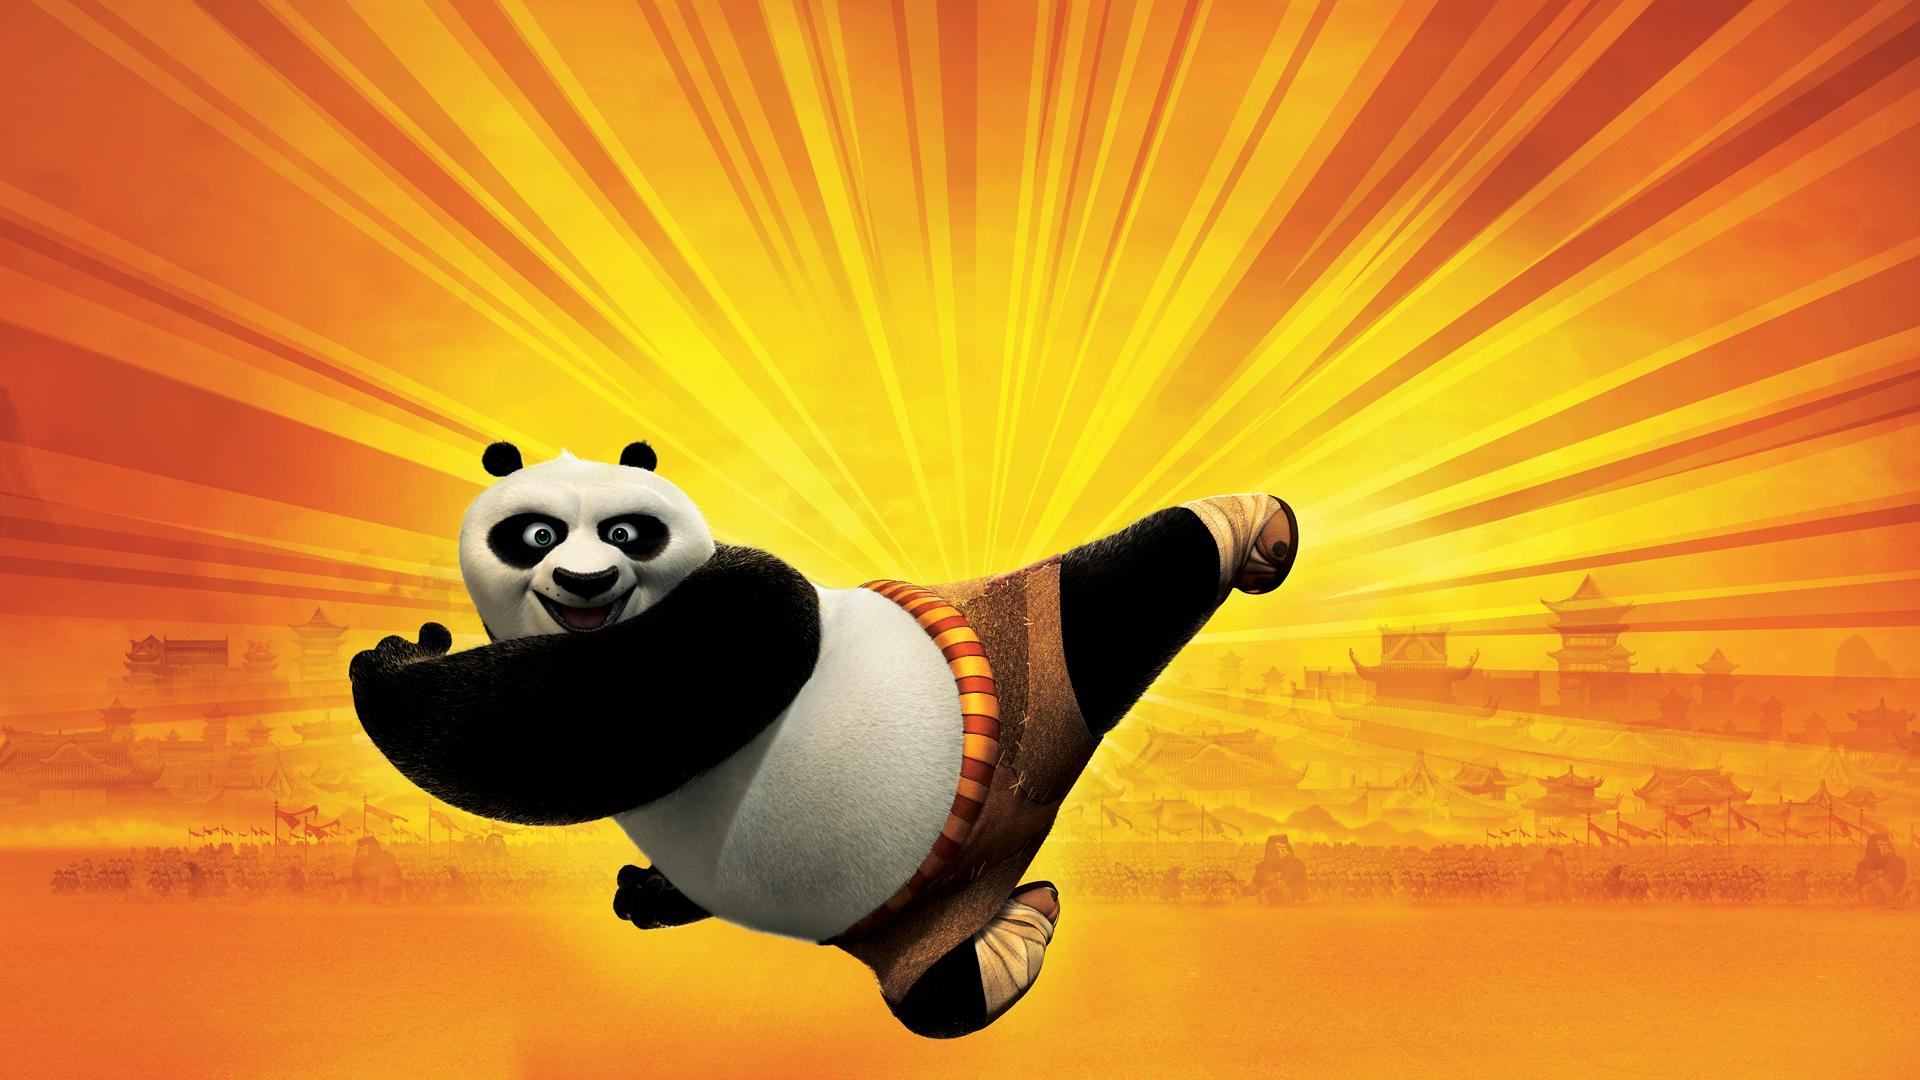 Cute Spongebob Squarepants Wallpaper Kung Fu Panda Wallpapers Hd Pixelstalk Net